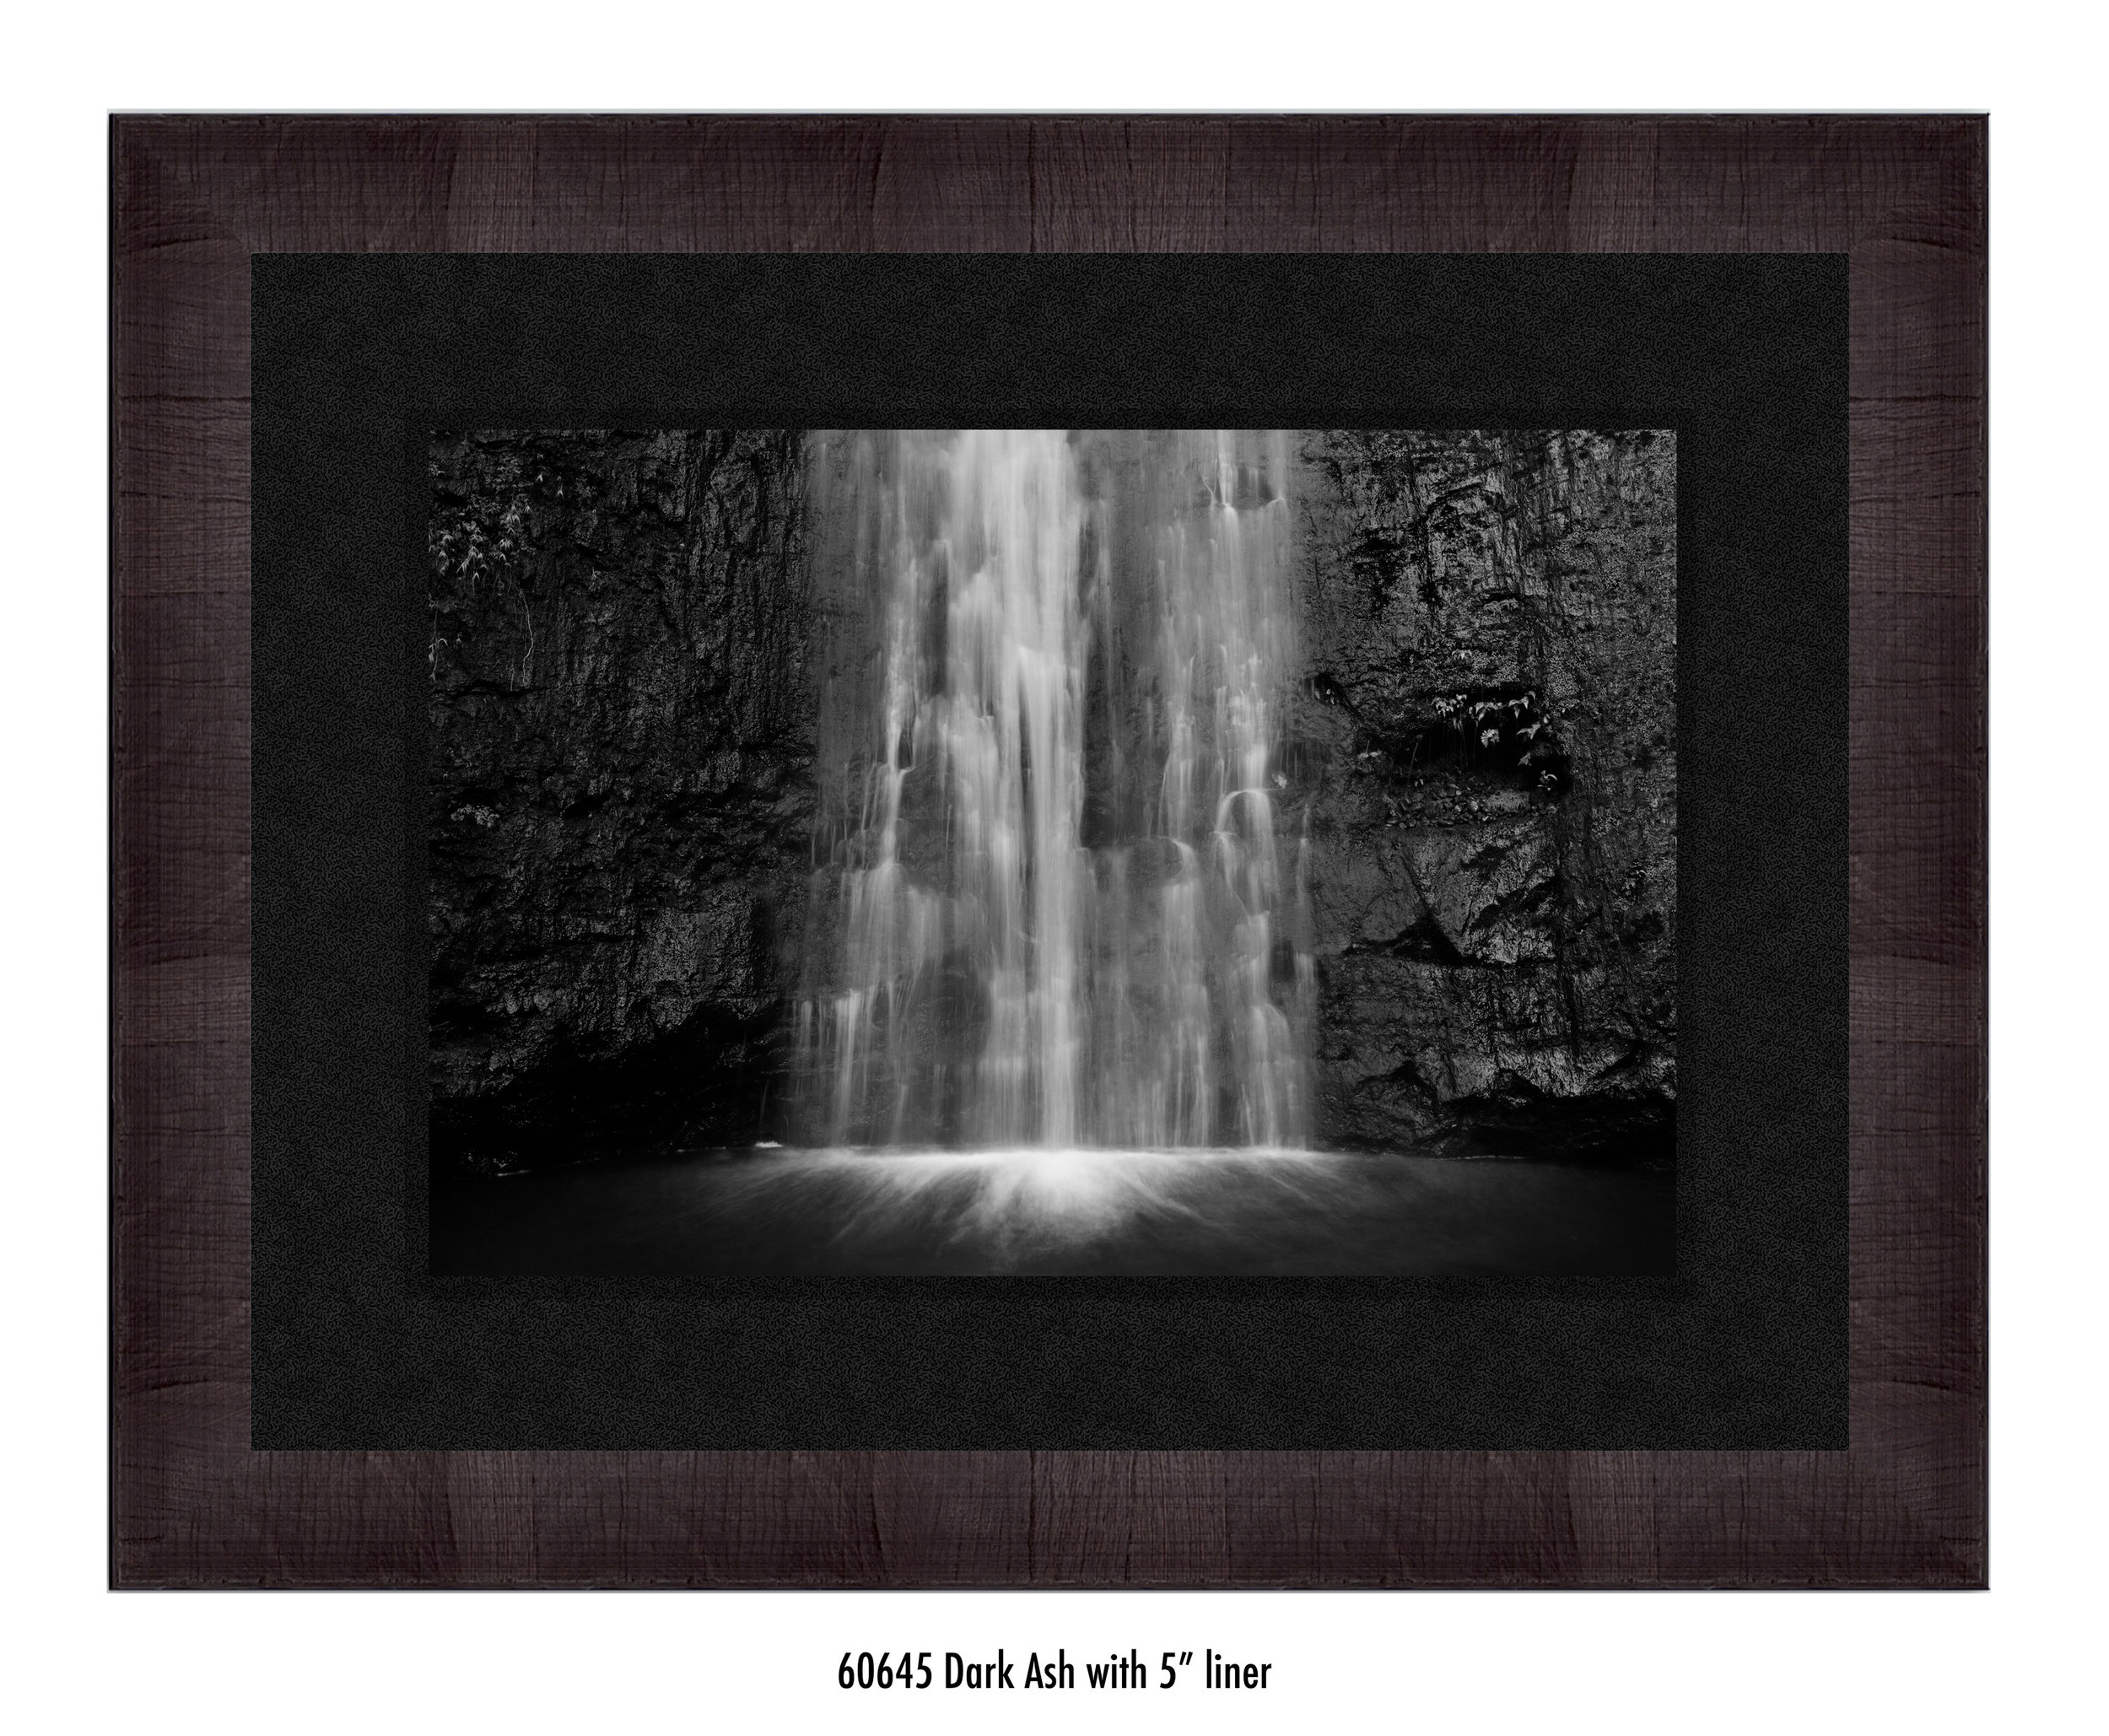 Manoa-Falls-60645-5-blk.jpg